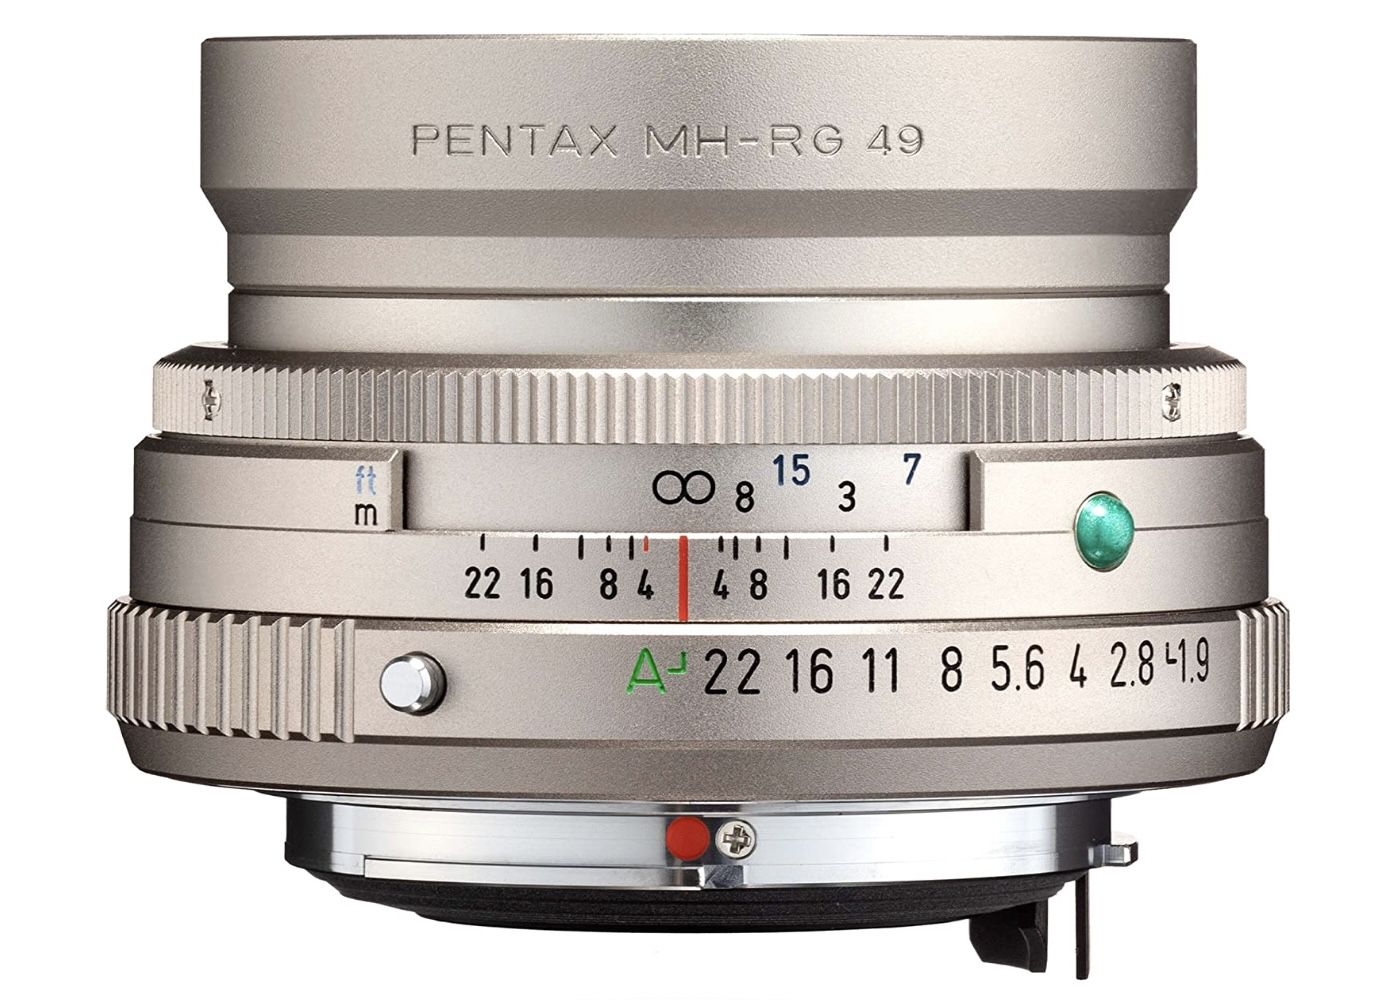 Pentax PENTAX FA 43mm F1.9 Limited Silber Weitwinkelobjektiv für 472,28€ (statt 649€)